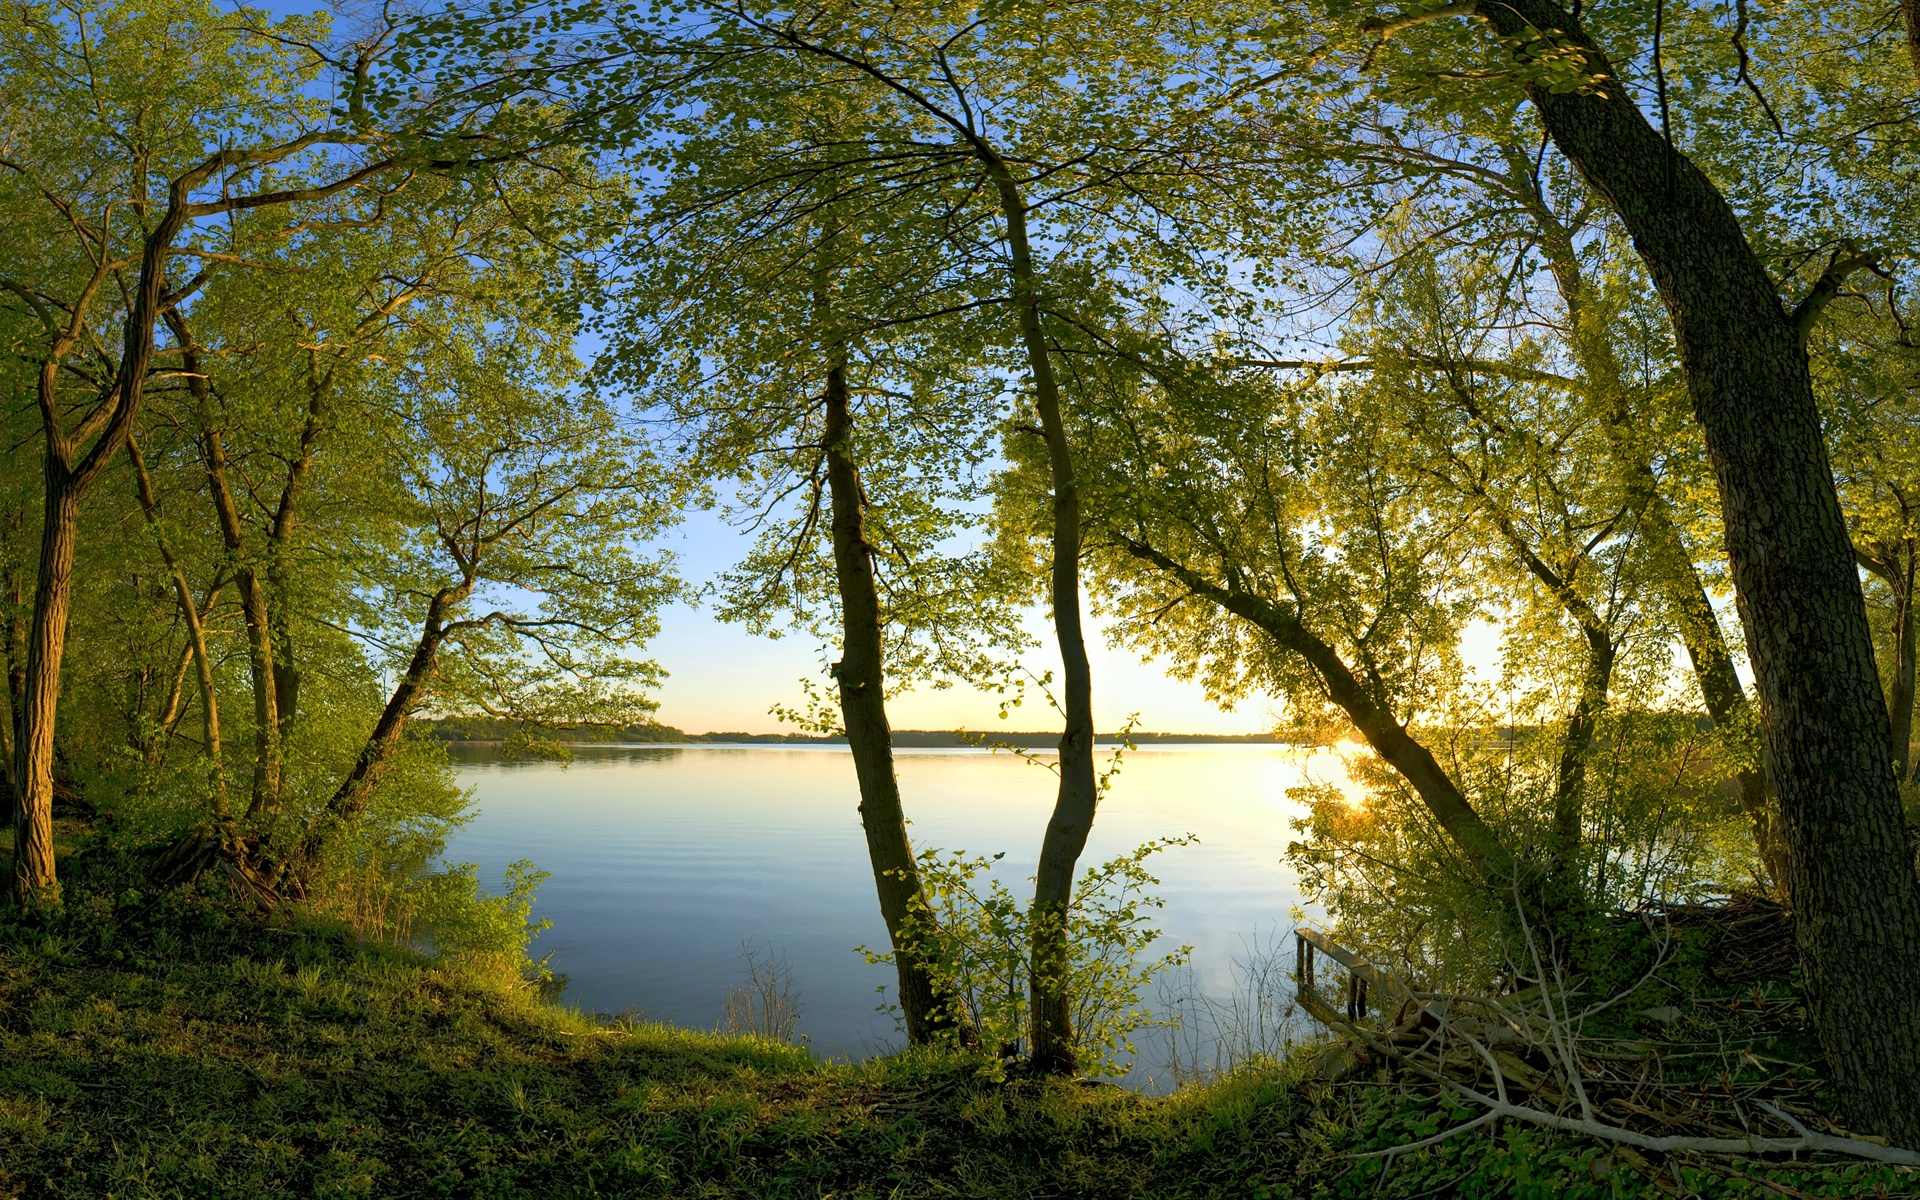 берег, трава, деревья